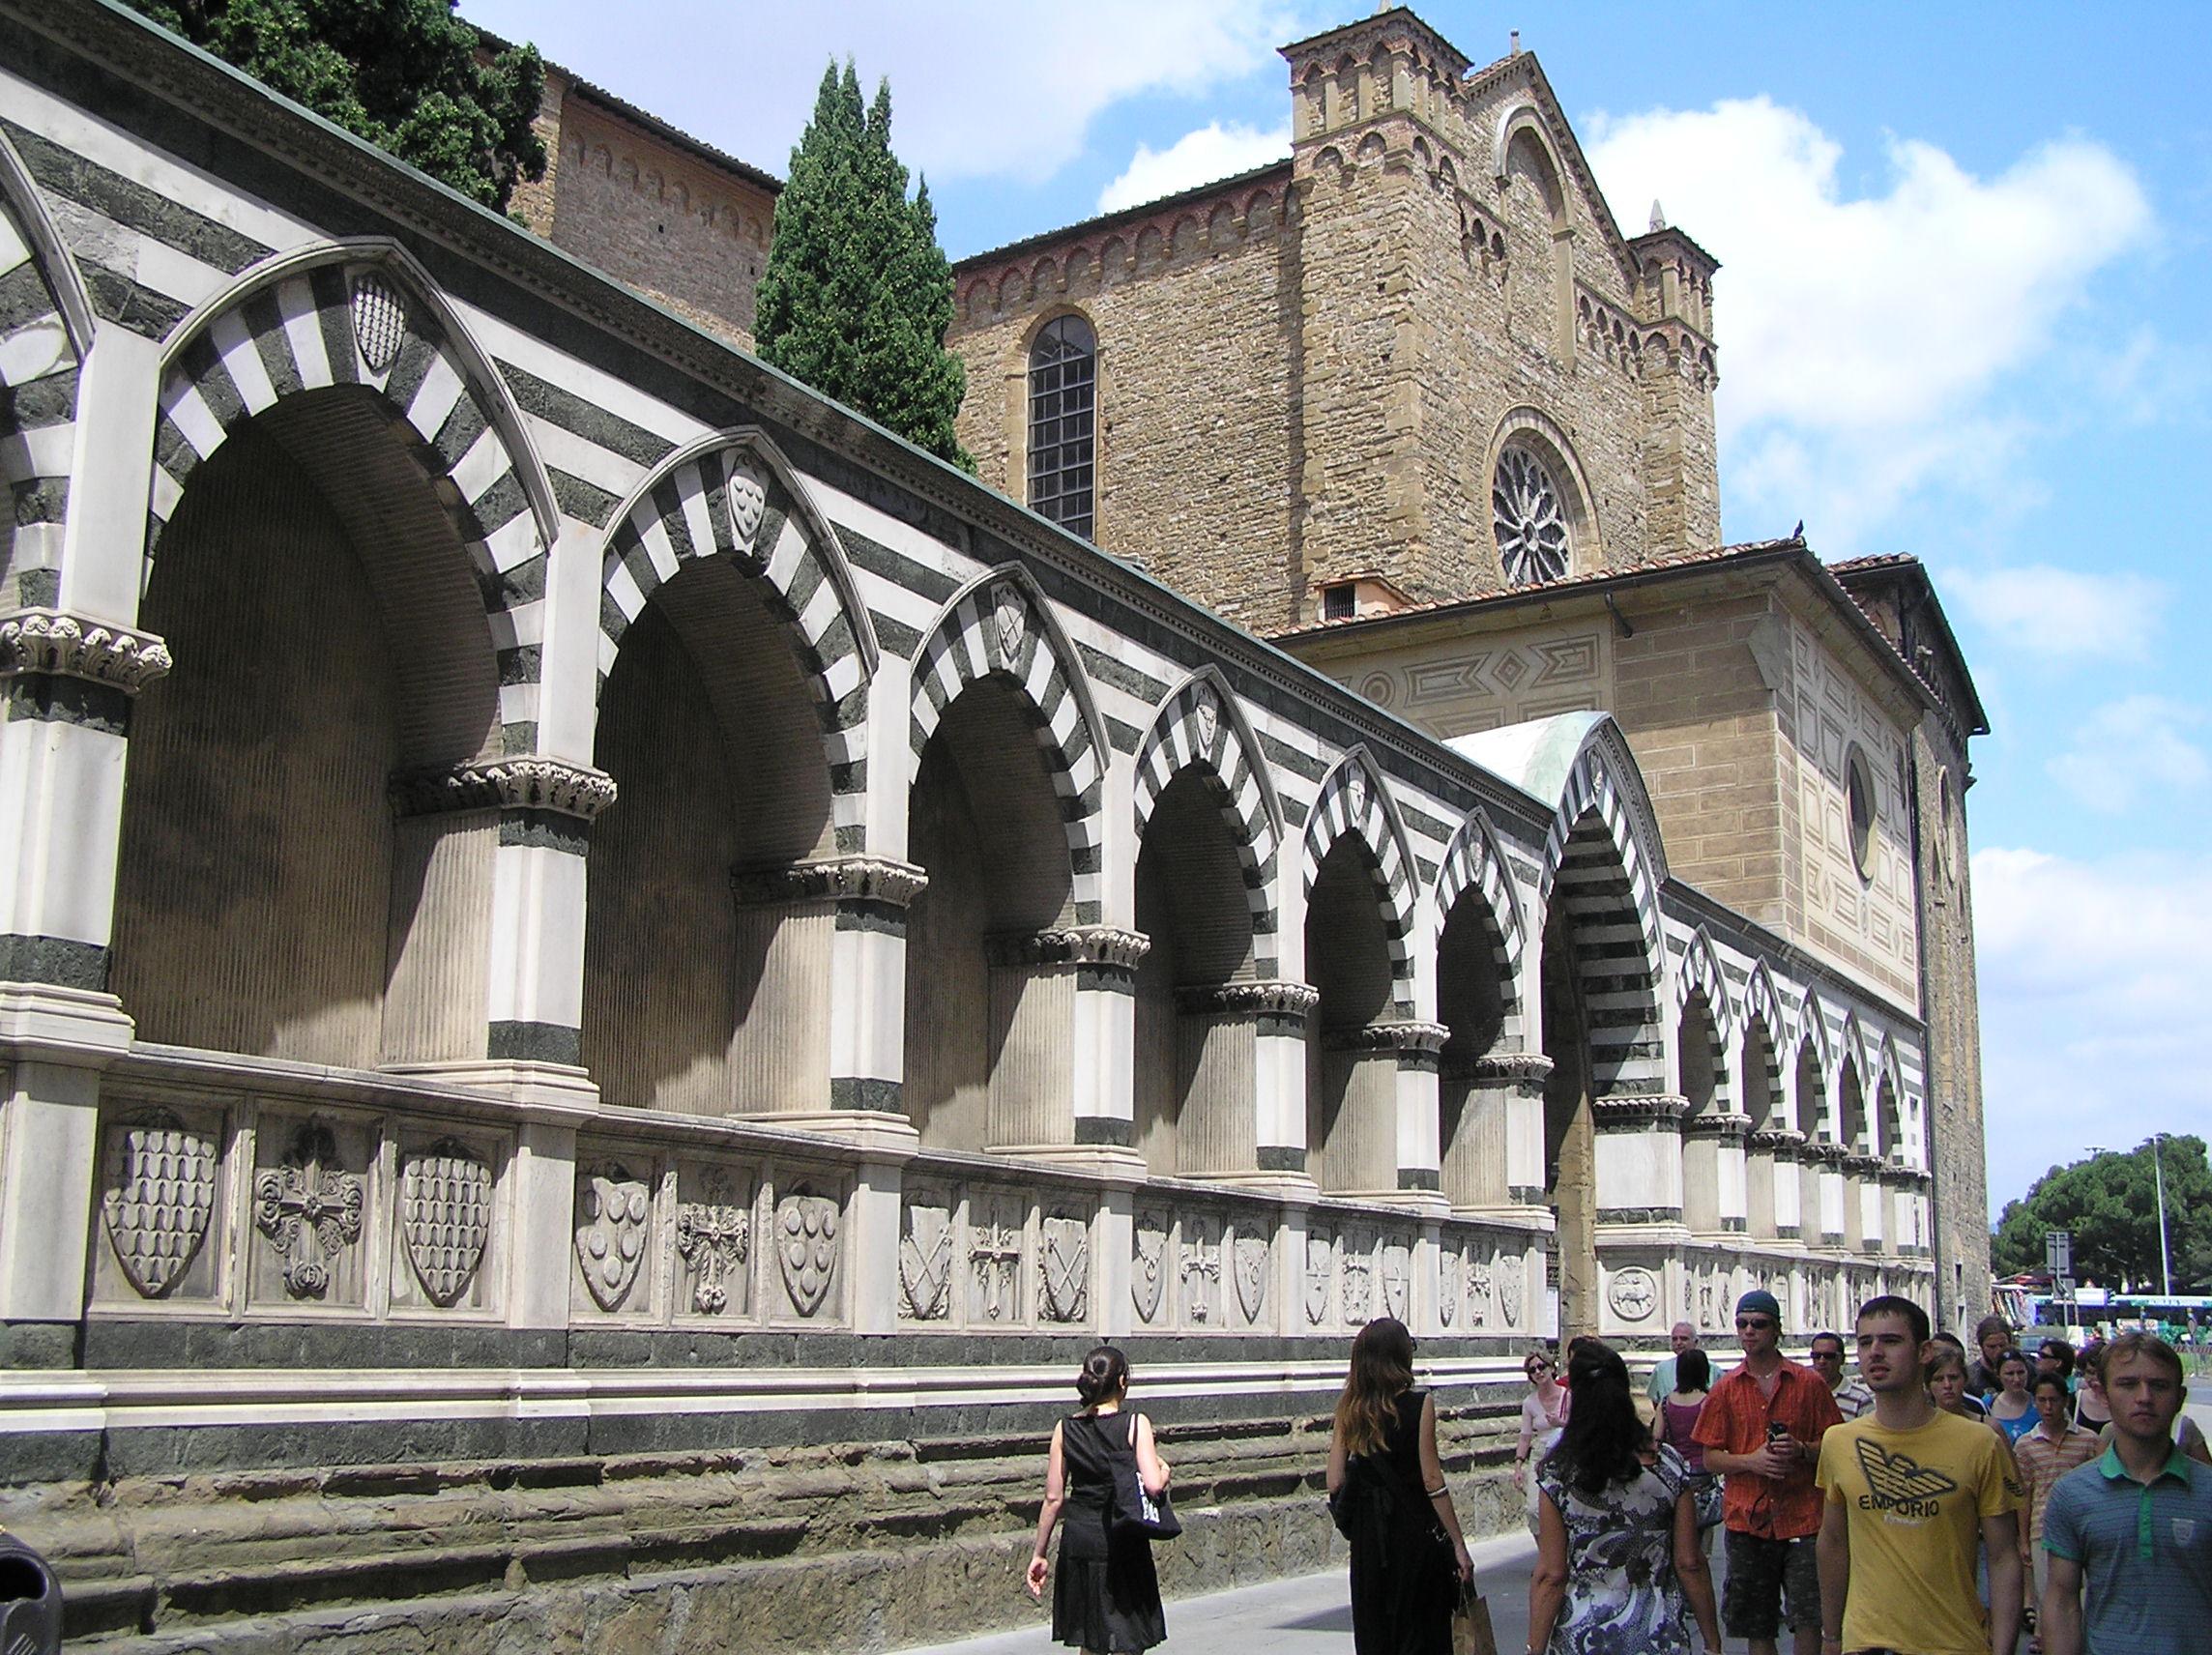 Itálie - Florencie - Santa Maria Novella, 1279-1357